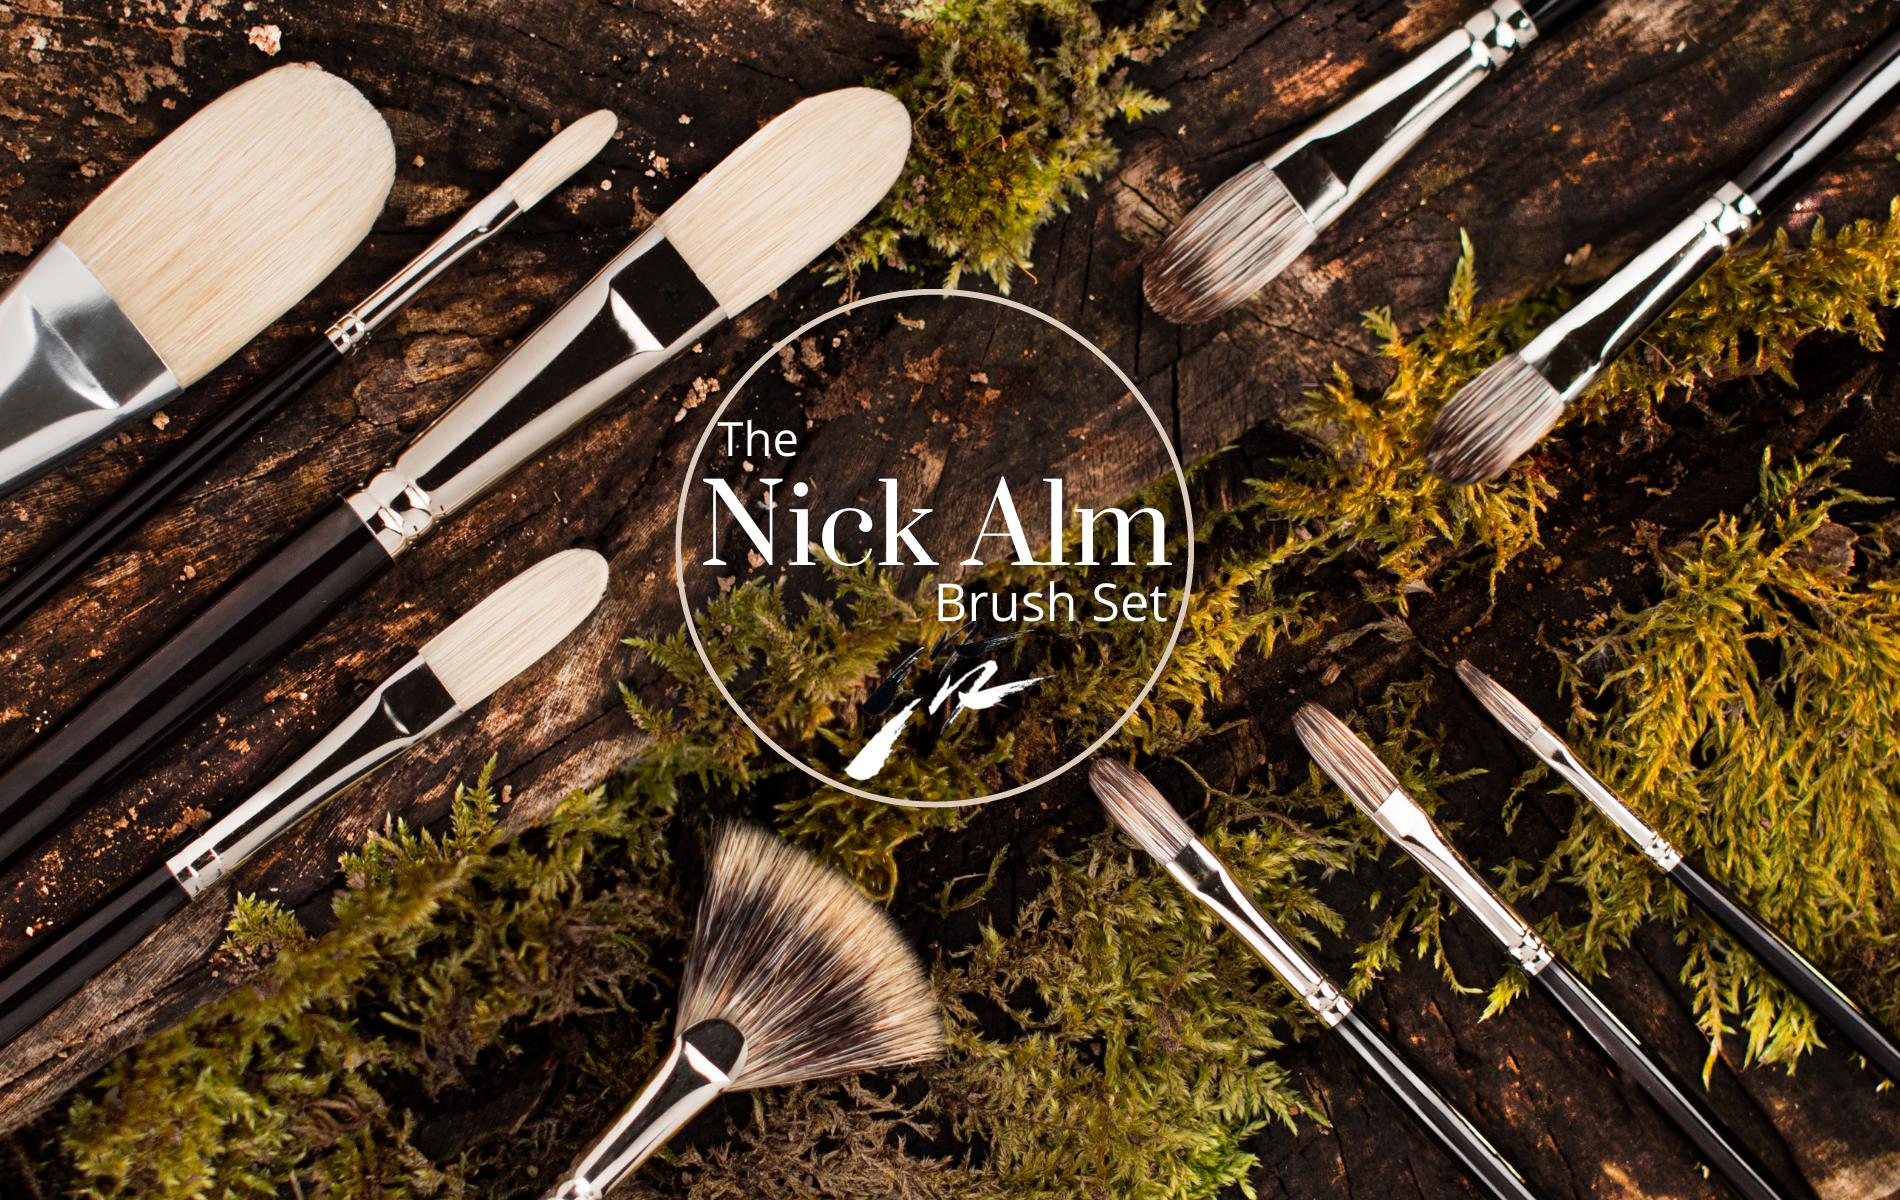 The Nick Alm Brush Set